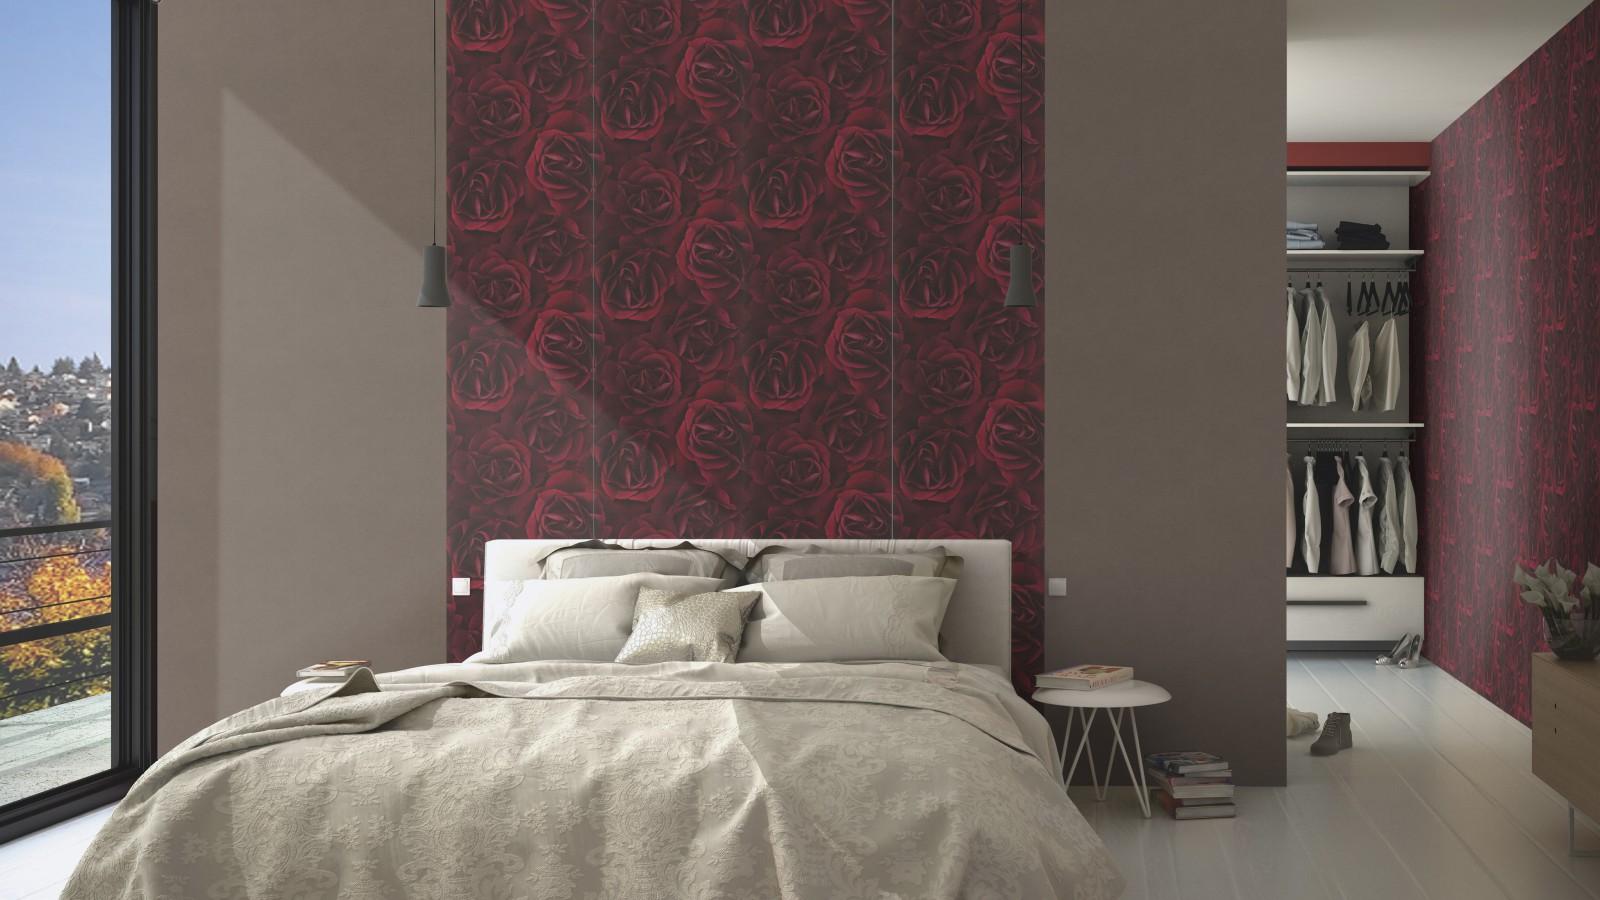 full size of uncategorizedunglaublich heimwerken aufregend - Heimwerken Aufregend Wandtatoo Schlafzimmer Konzeption